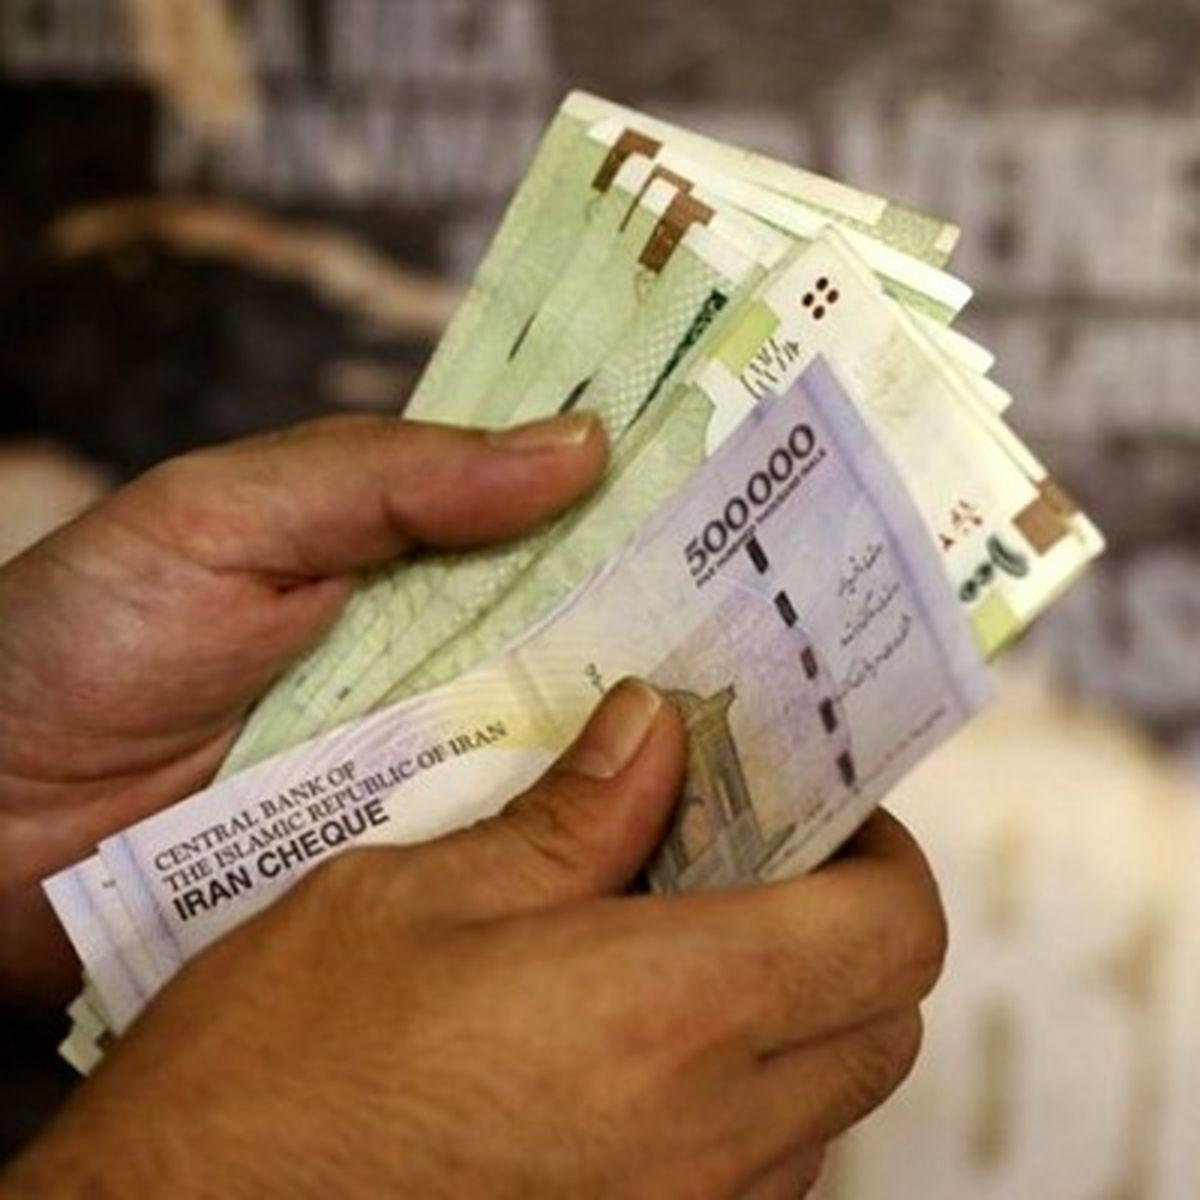 تصویب افزایش حق مسکن کارگری در کمیسیون اقتصادی دولت